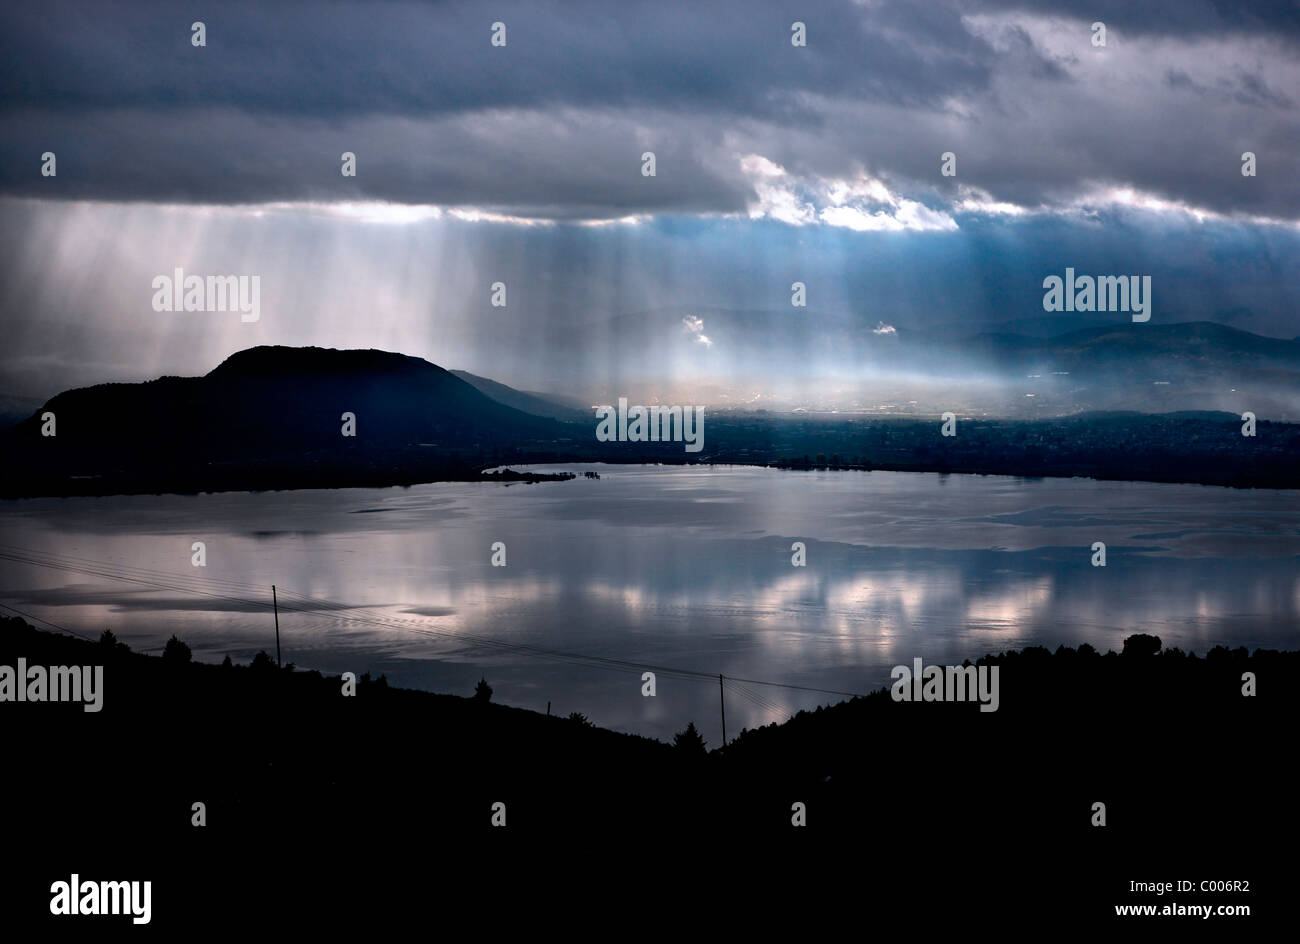 Tormenta viniendo en Pamvotis (o 'Pamvotida') Lago, Ioannina, Epiro, Grecia Imagen De Stock